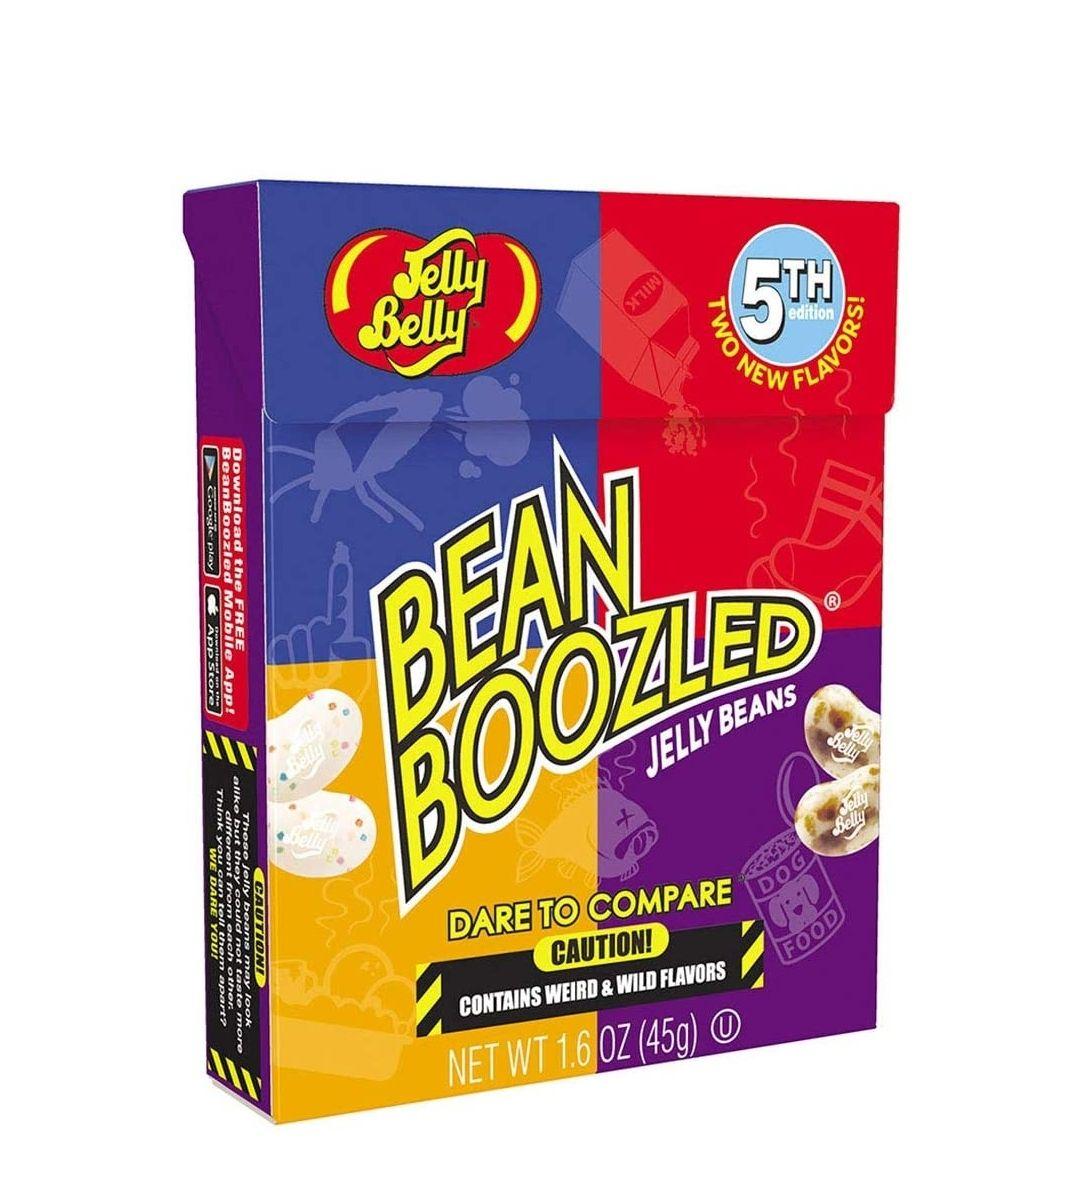 Amazon: BeanBoozled Jelly belly